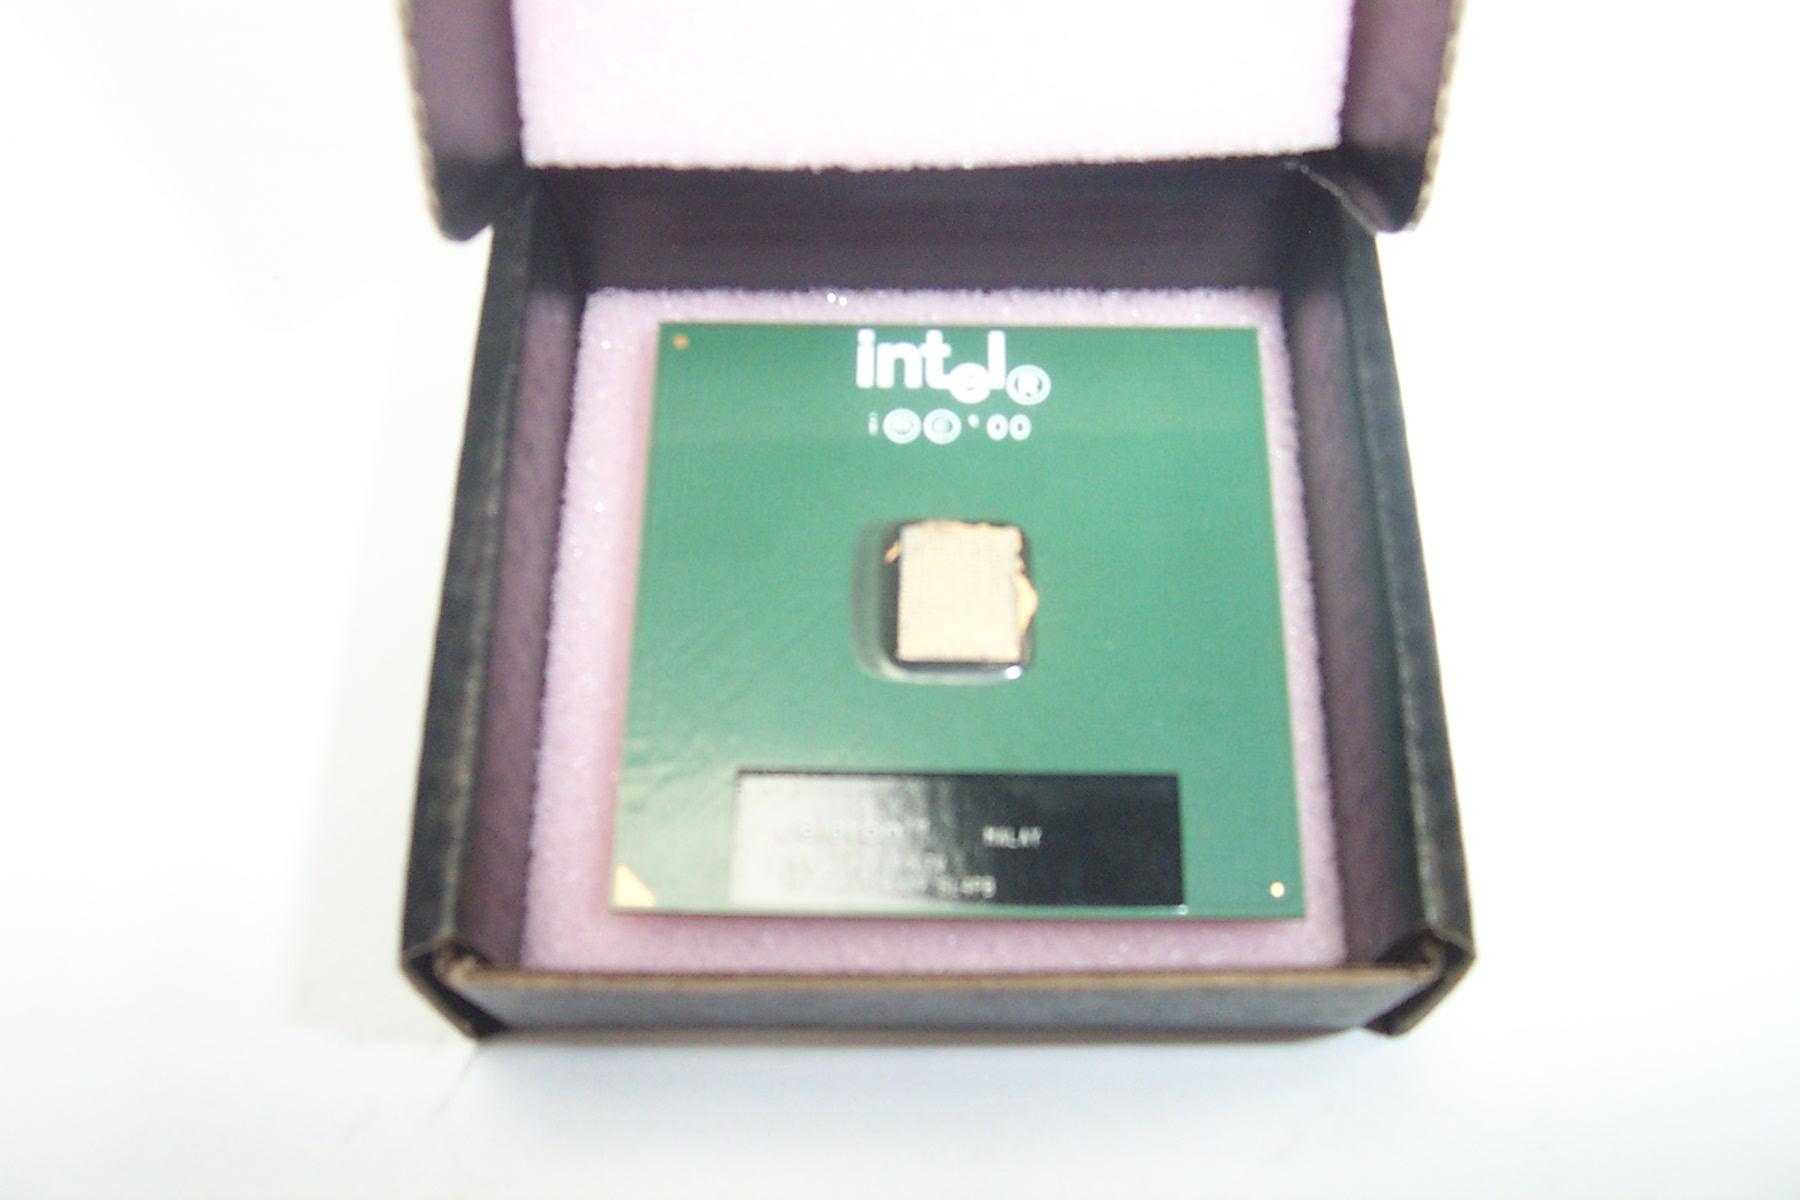 Intel SL4PB Celeron 600MHz Socket 370 Processor